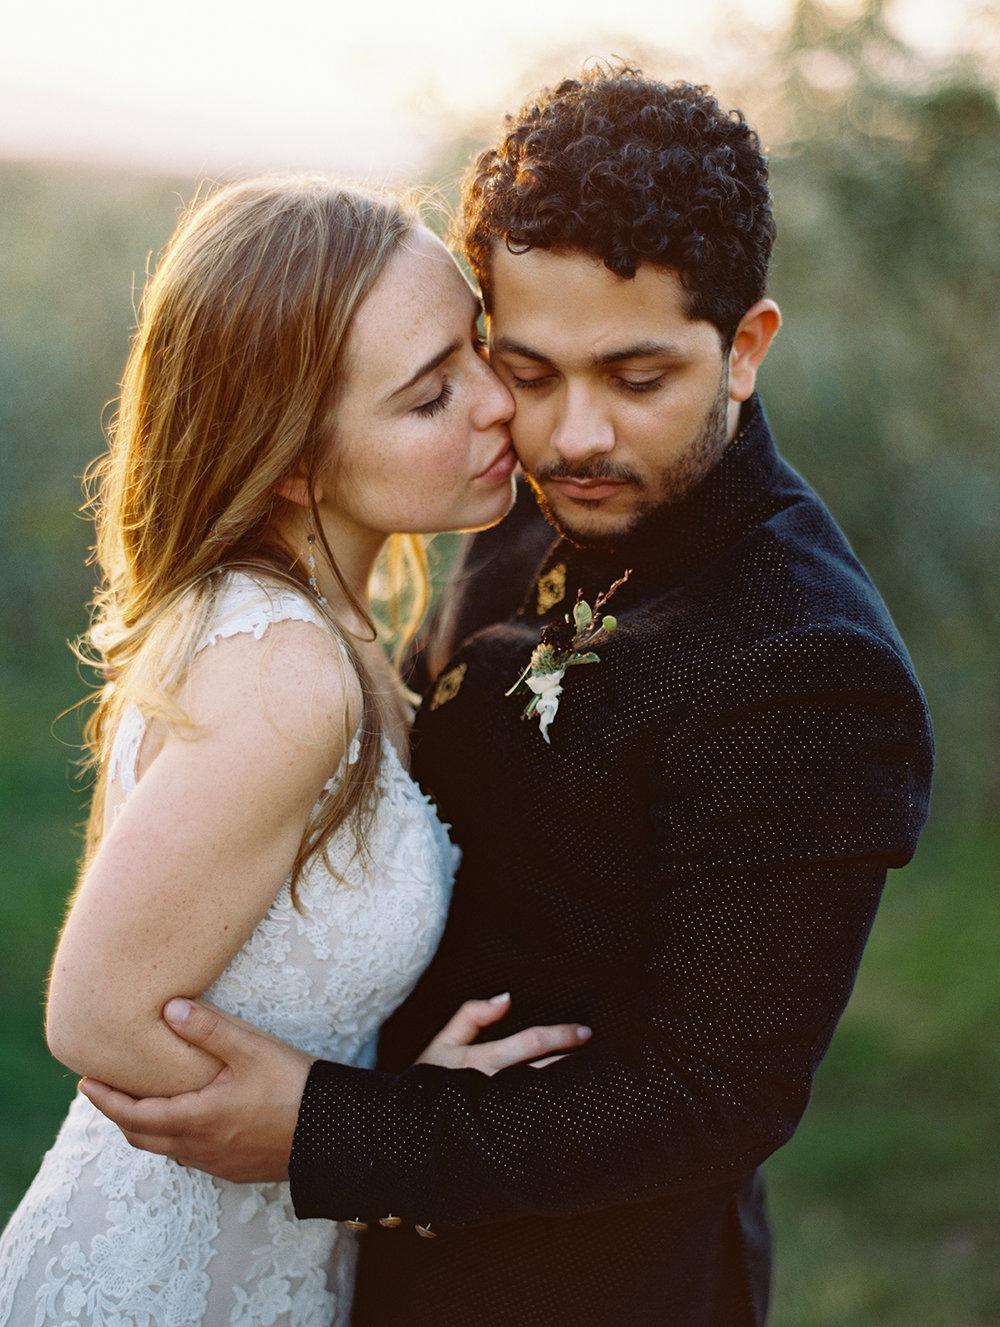 Eli-Savannah-Wedding-Italy-Brumley-Wells-Photography-451.jpg